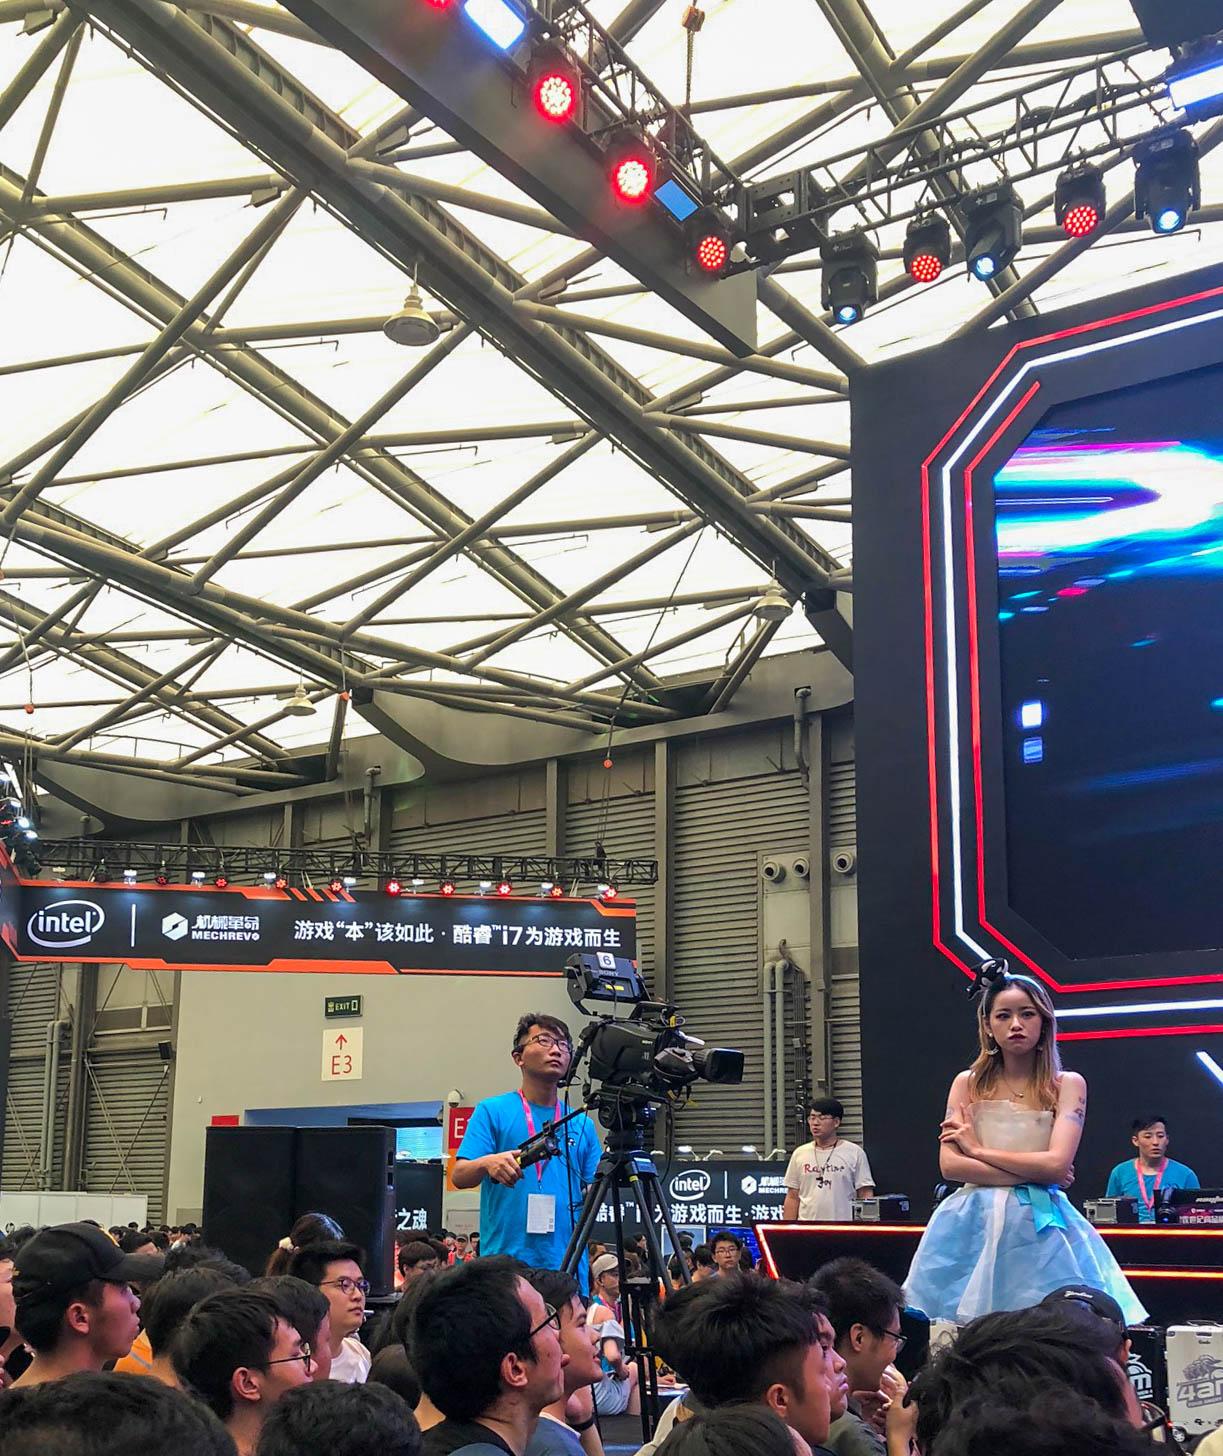 2019 ChinaJoy 中国国际数码互动娱乐展览会 游玩 第12张